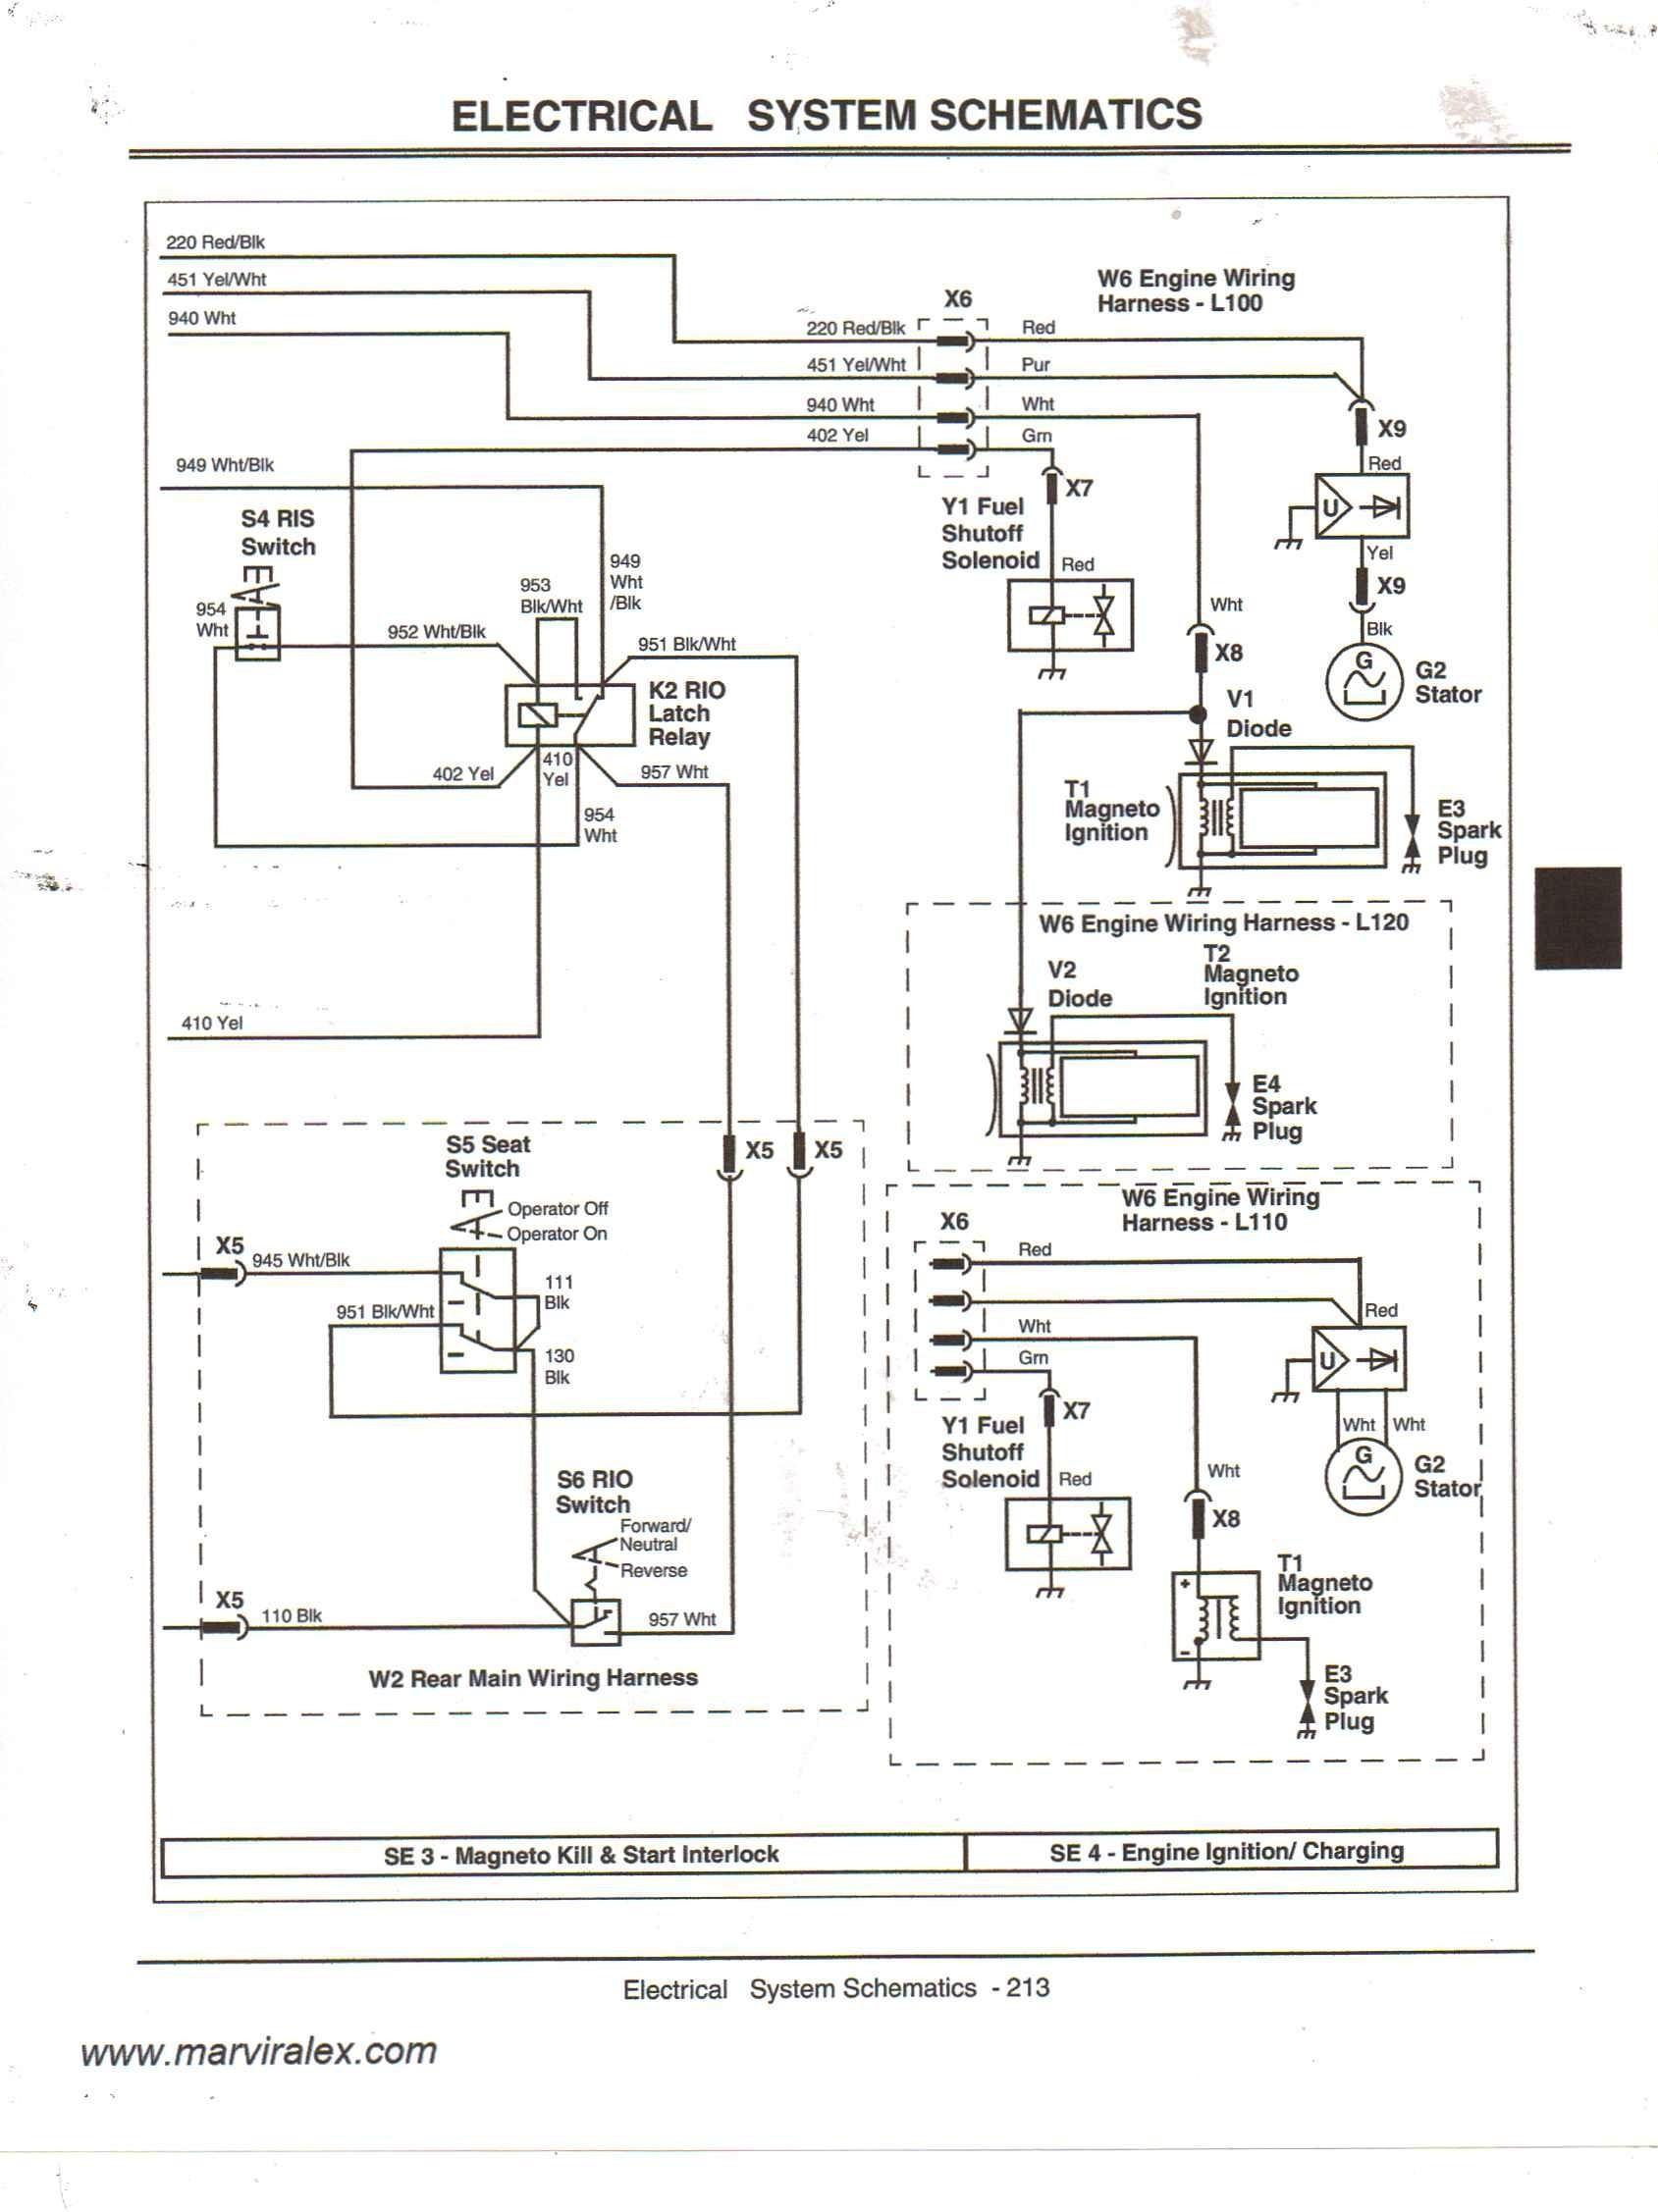 Schematics On A 345 John Deere Nd 2800] Wiring Diagram John Deere F525 Also John Deere F525 Of Schematics On A 345 John Deere